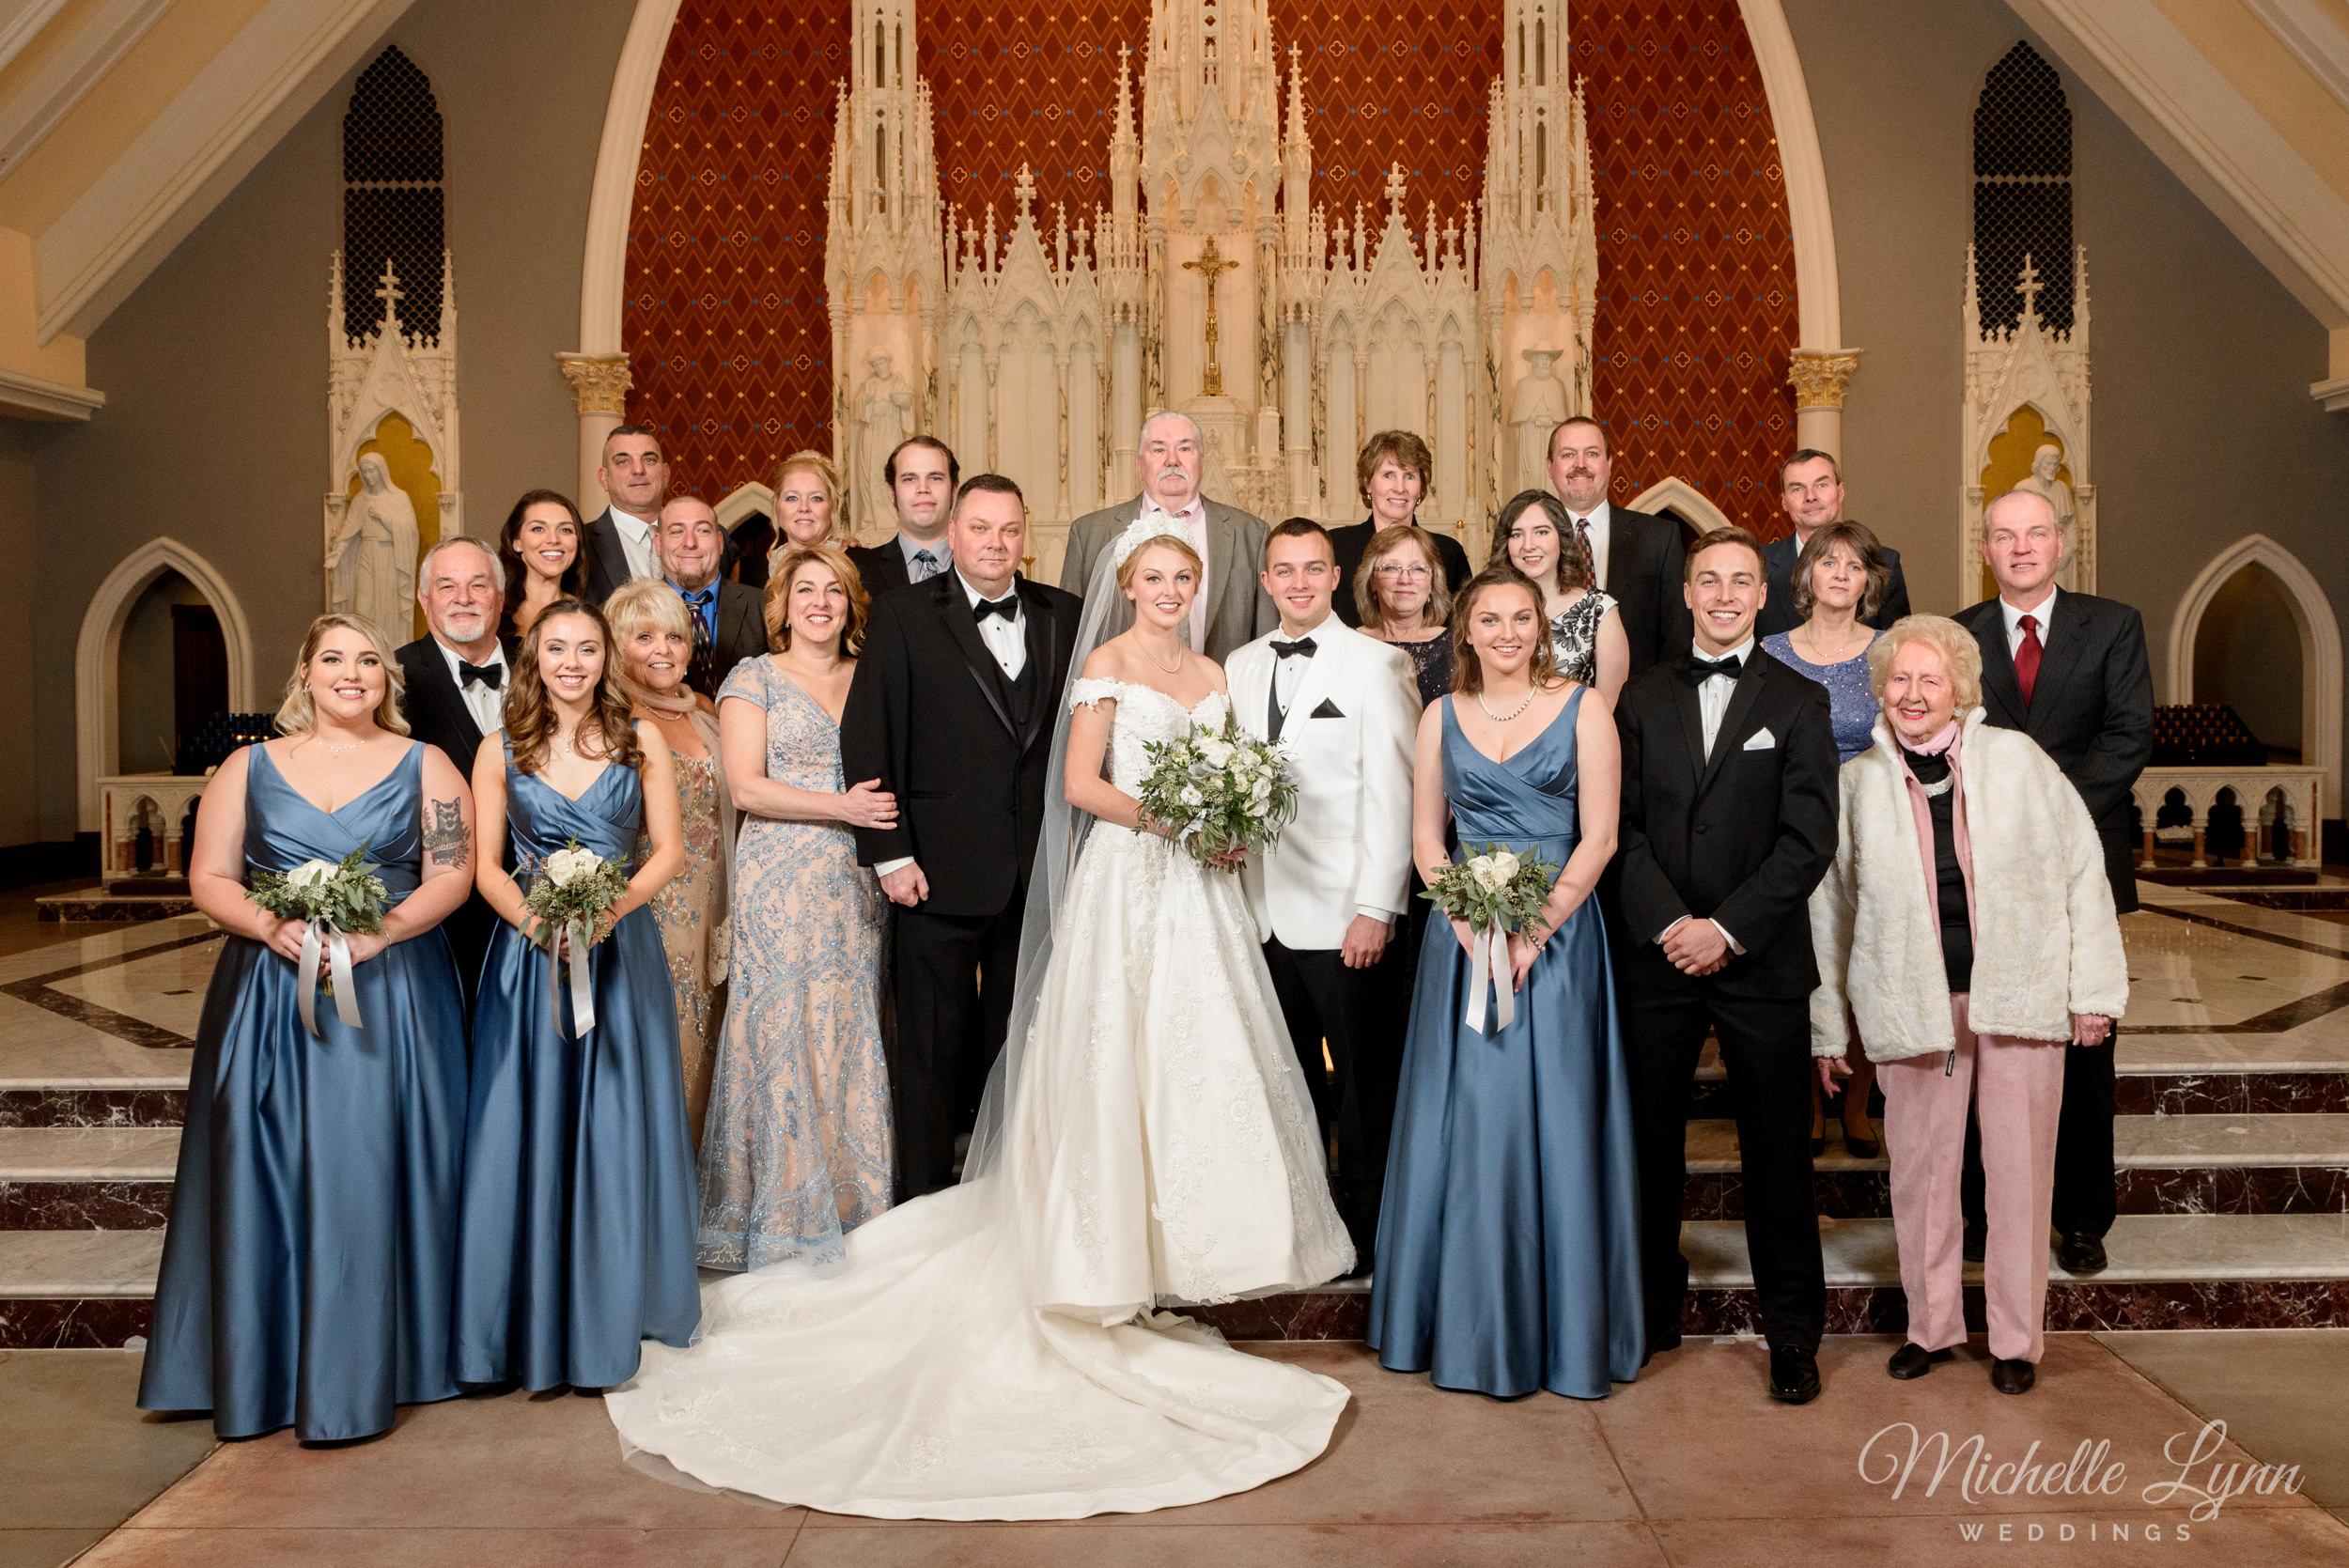 william-penn-inn-wedding-photography-mlw-69.jpg